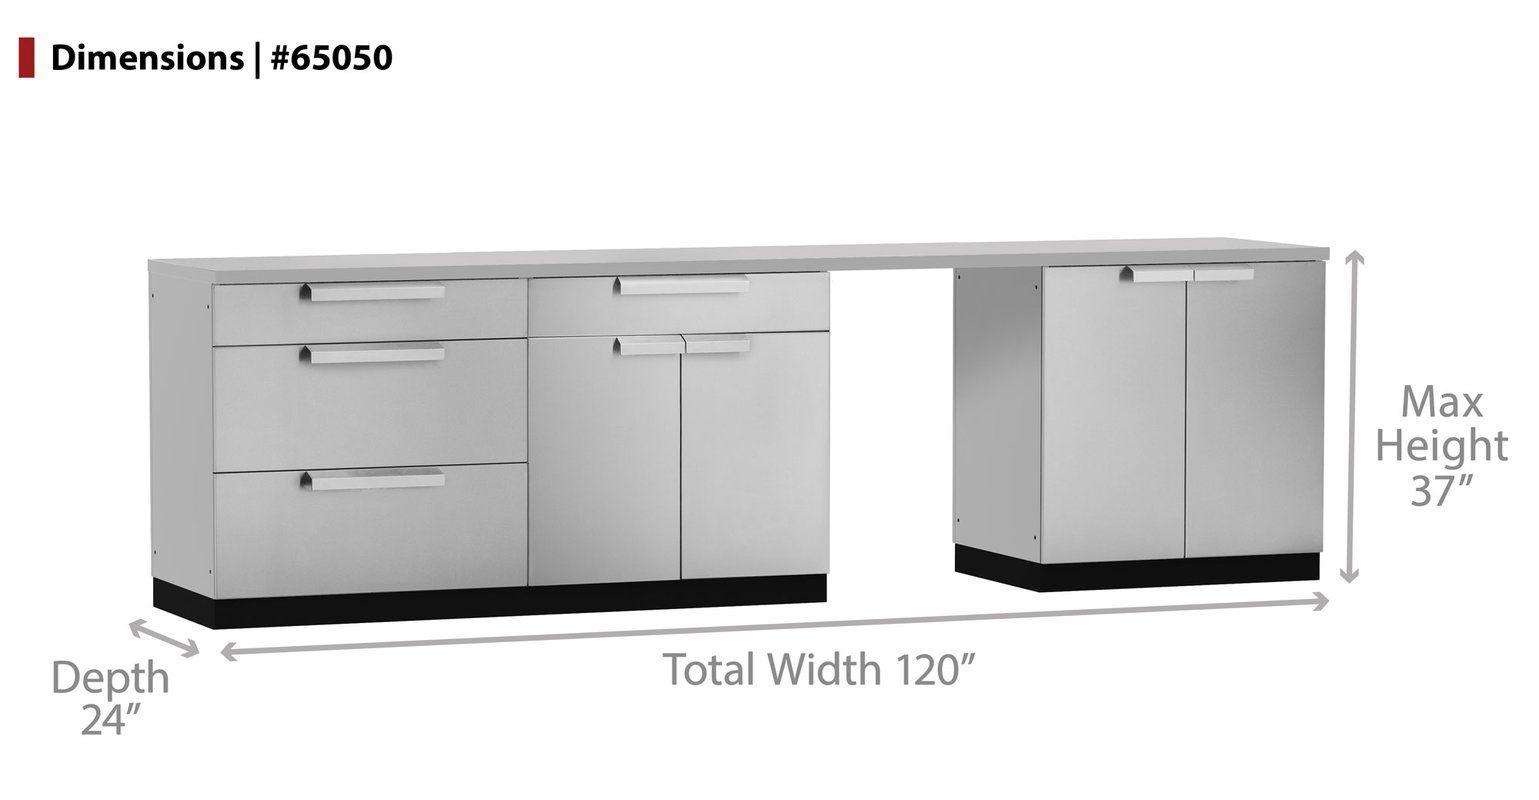 Stainless Steel 3 Piece Modular Outdoor Kitchen Cabinets Outdoor Kitchen Cabinets Modular Outdoor Kitchens Custom Countertops